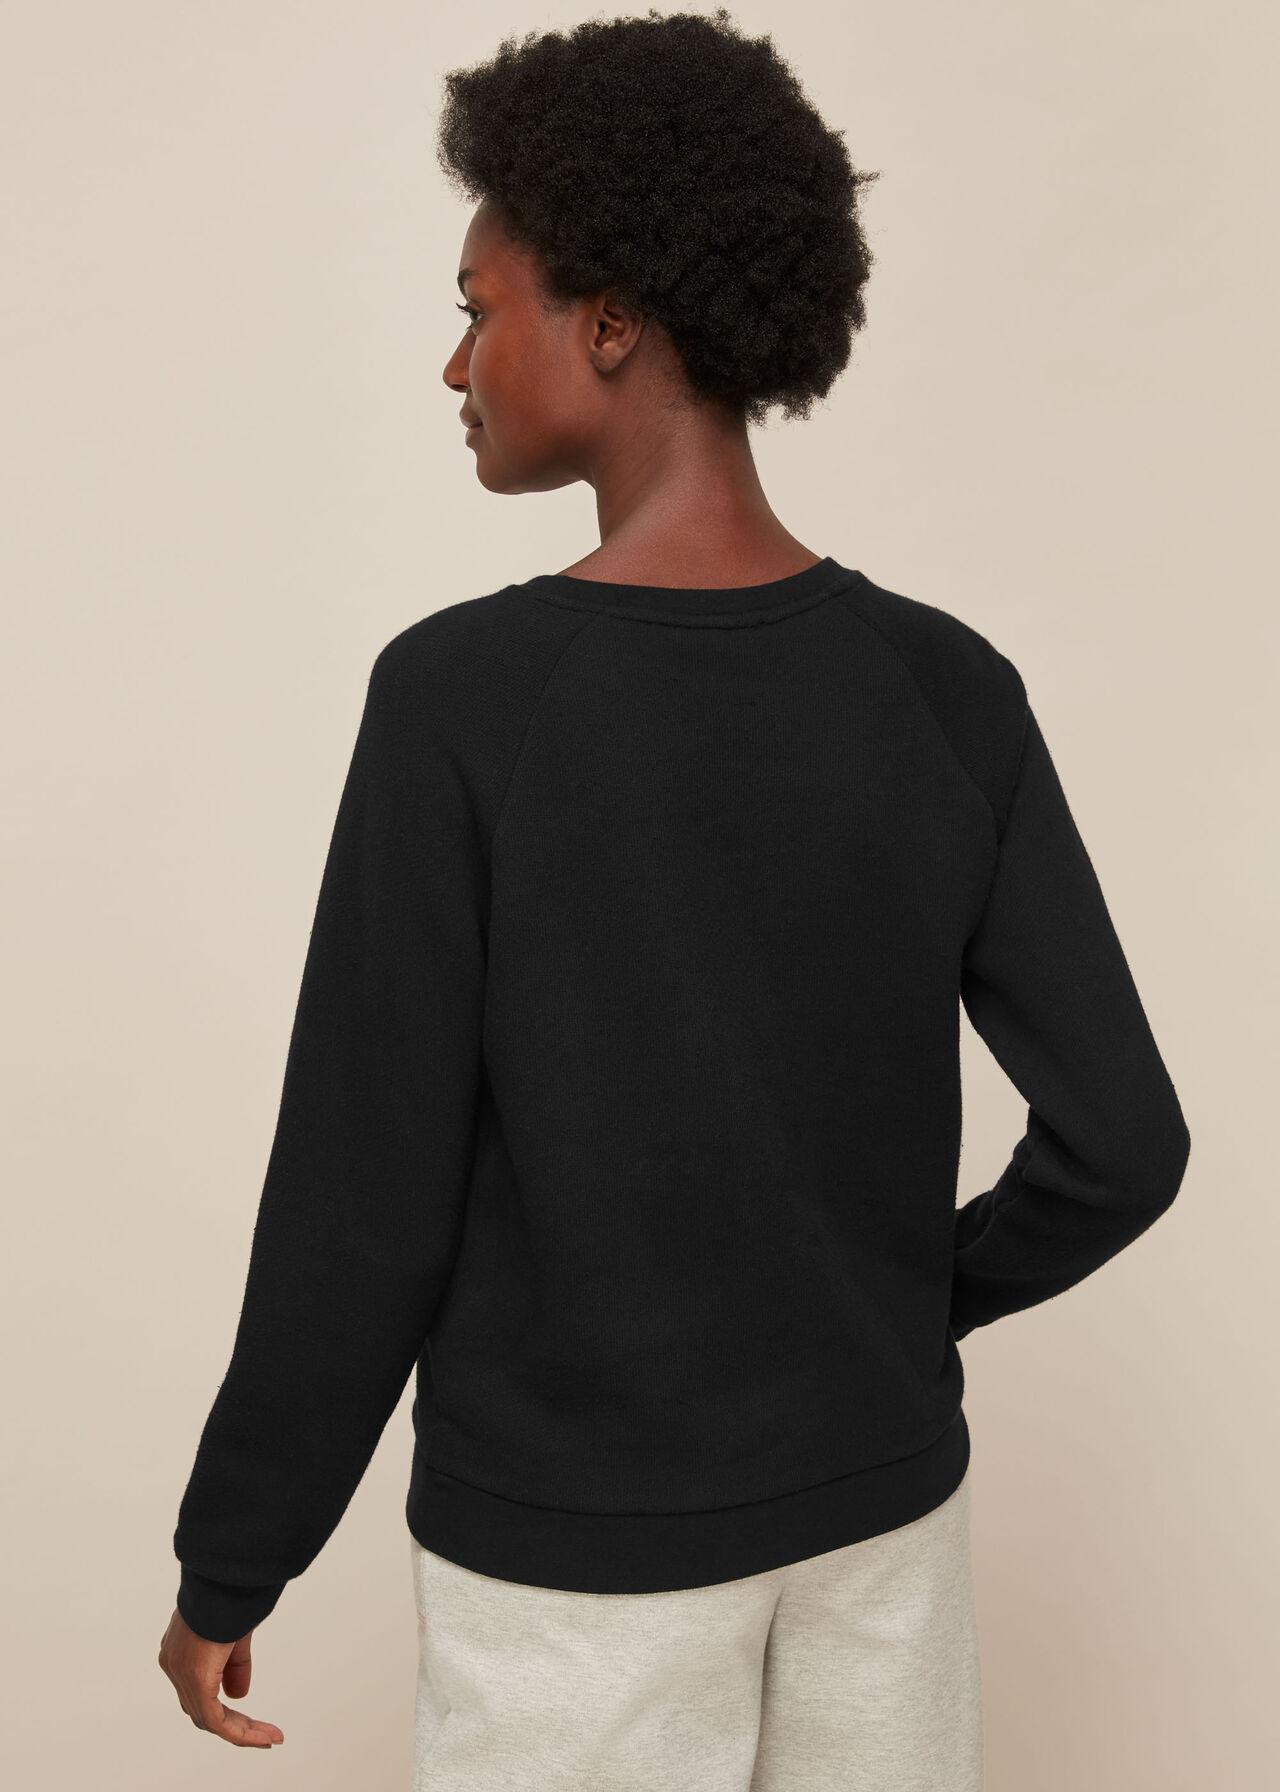 Ca Va Logo Sweatshirt